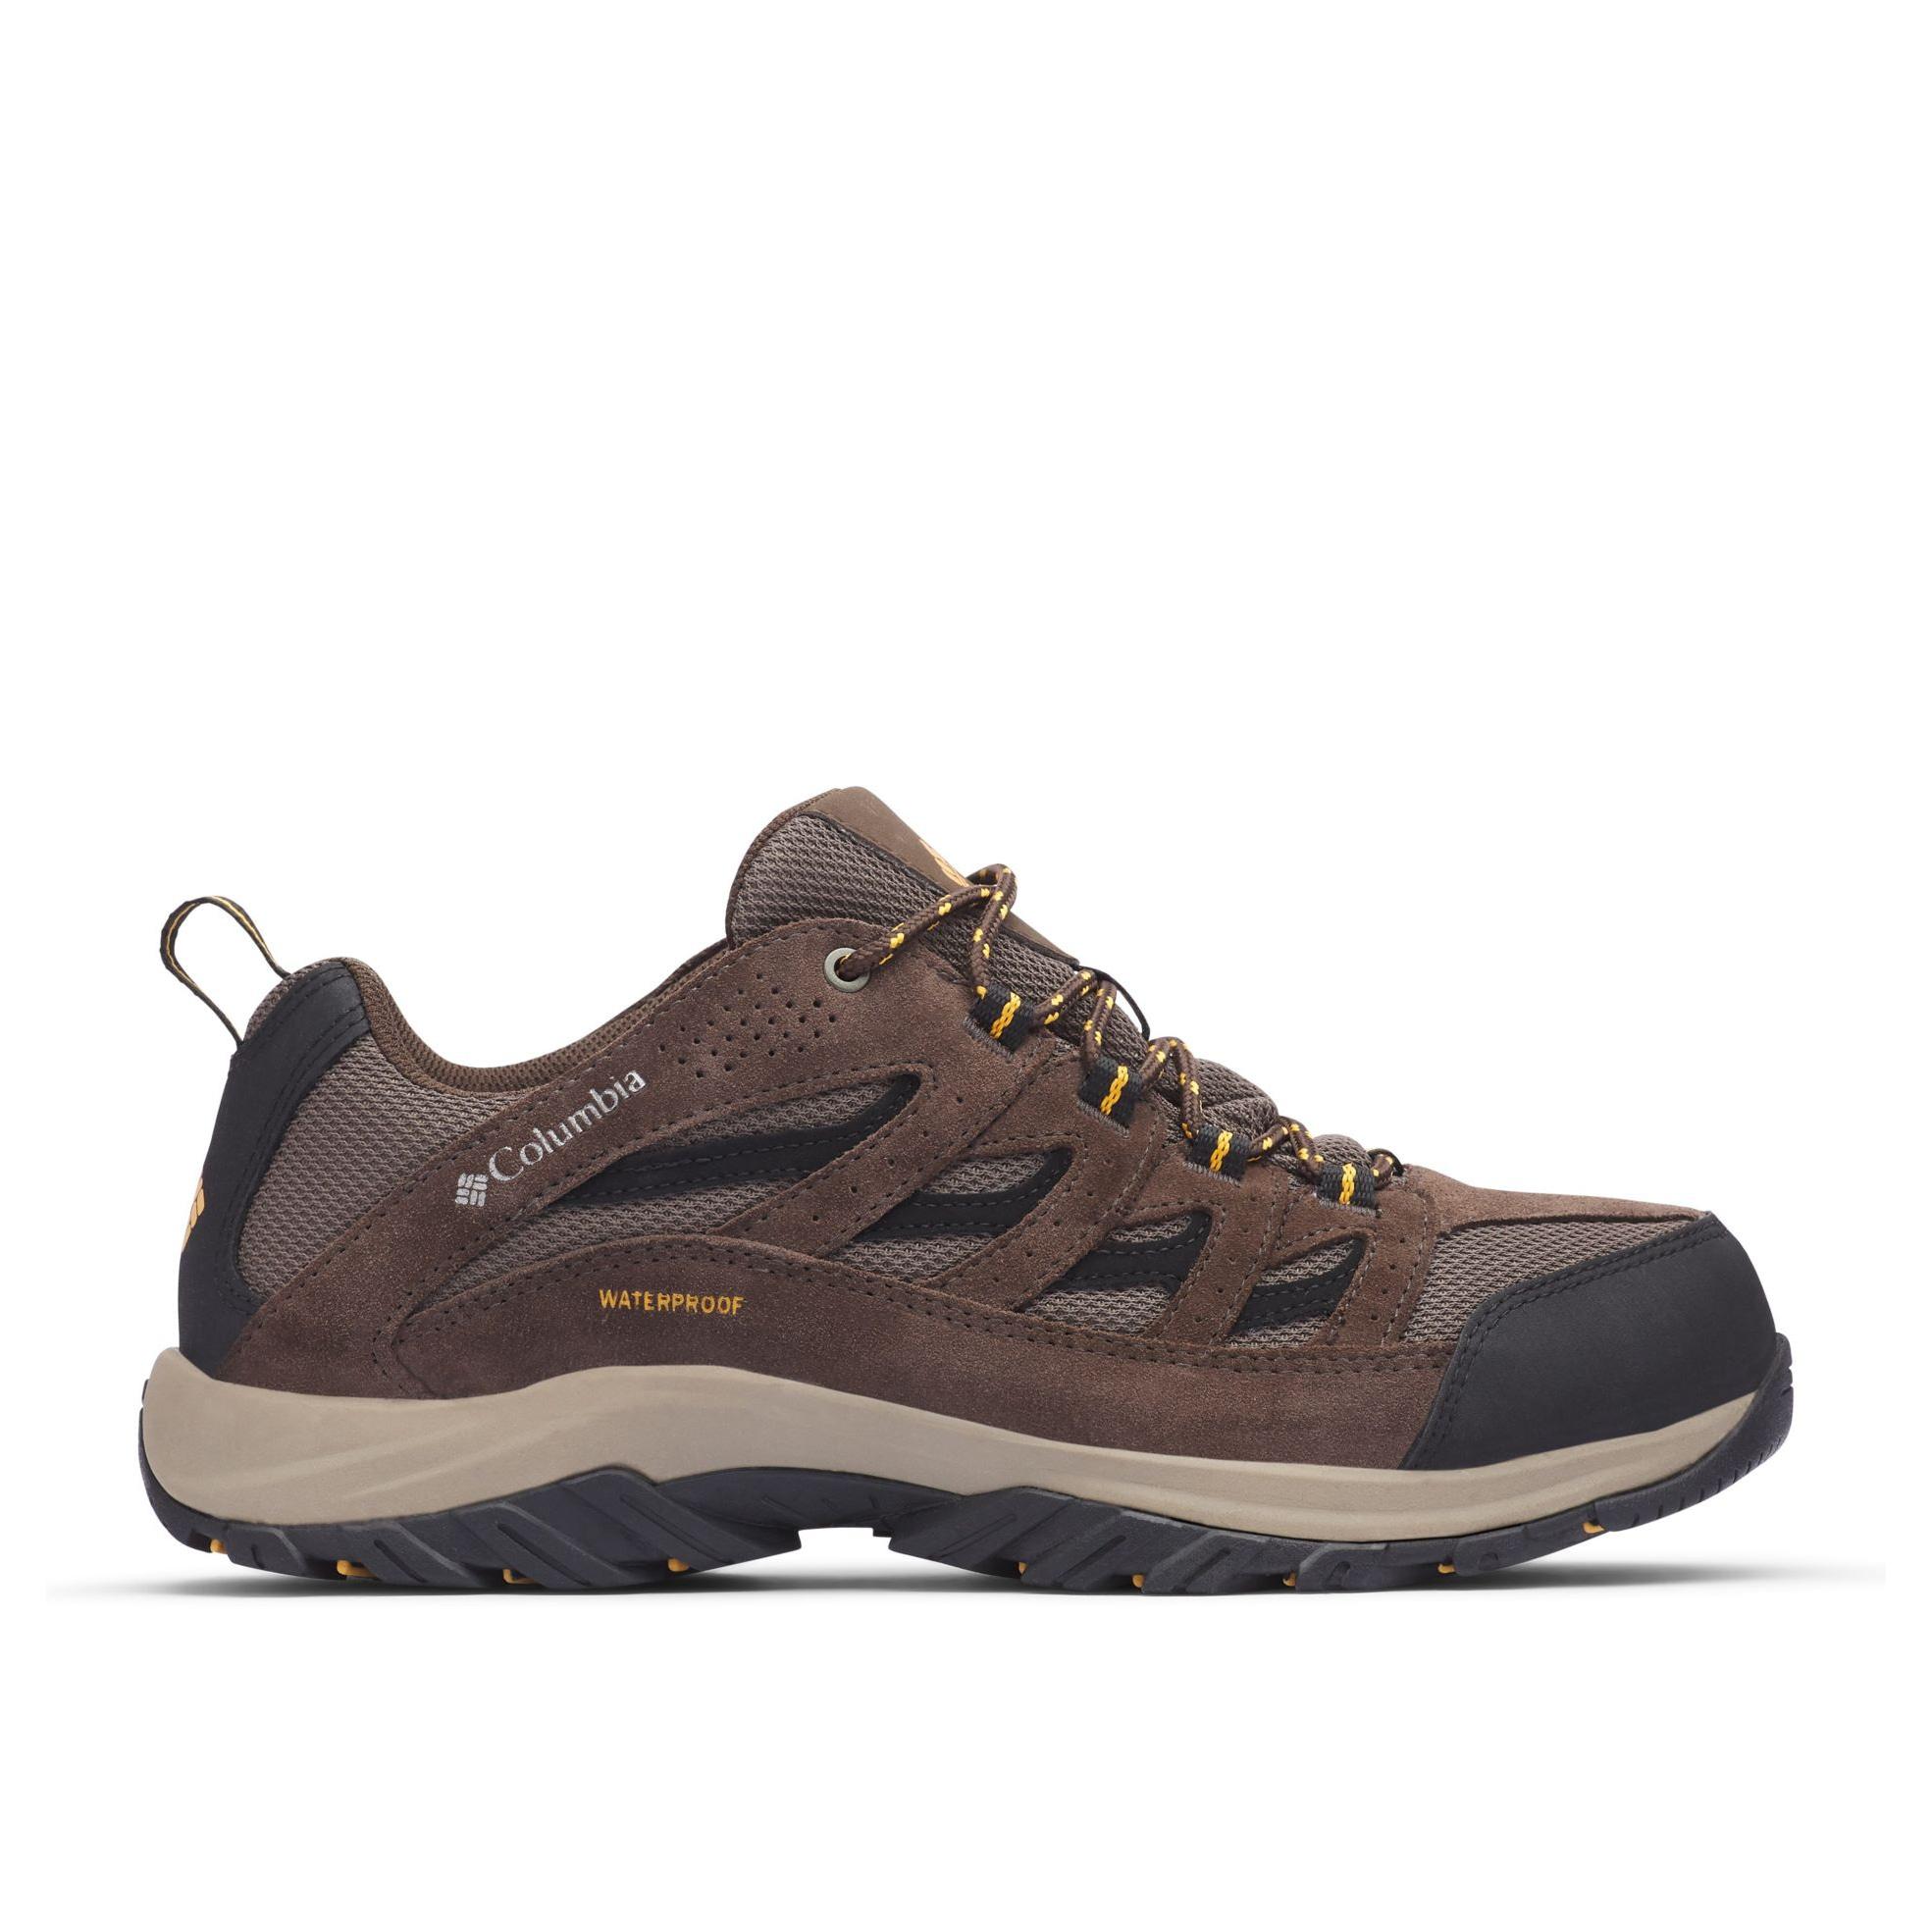 Crestwood WP Boot - Men's